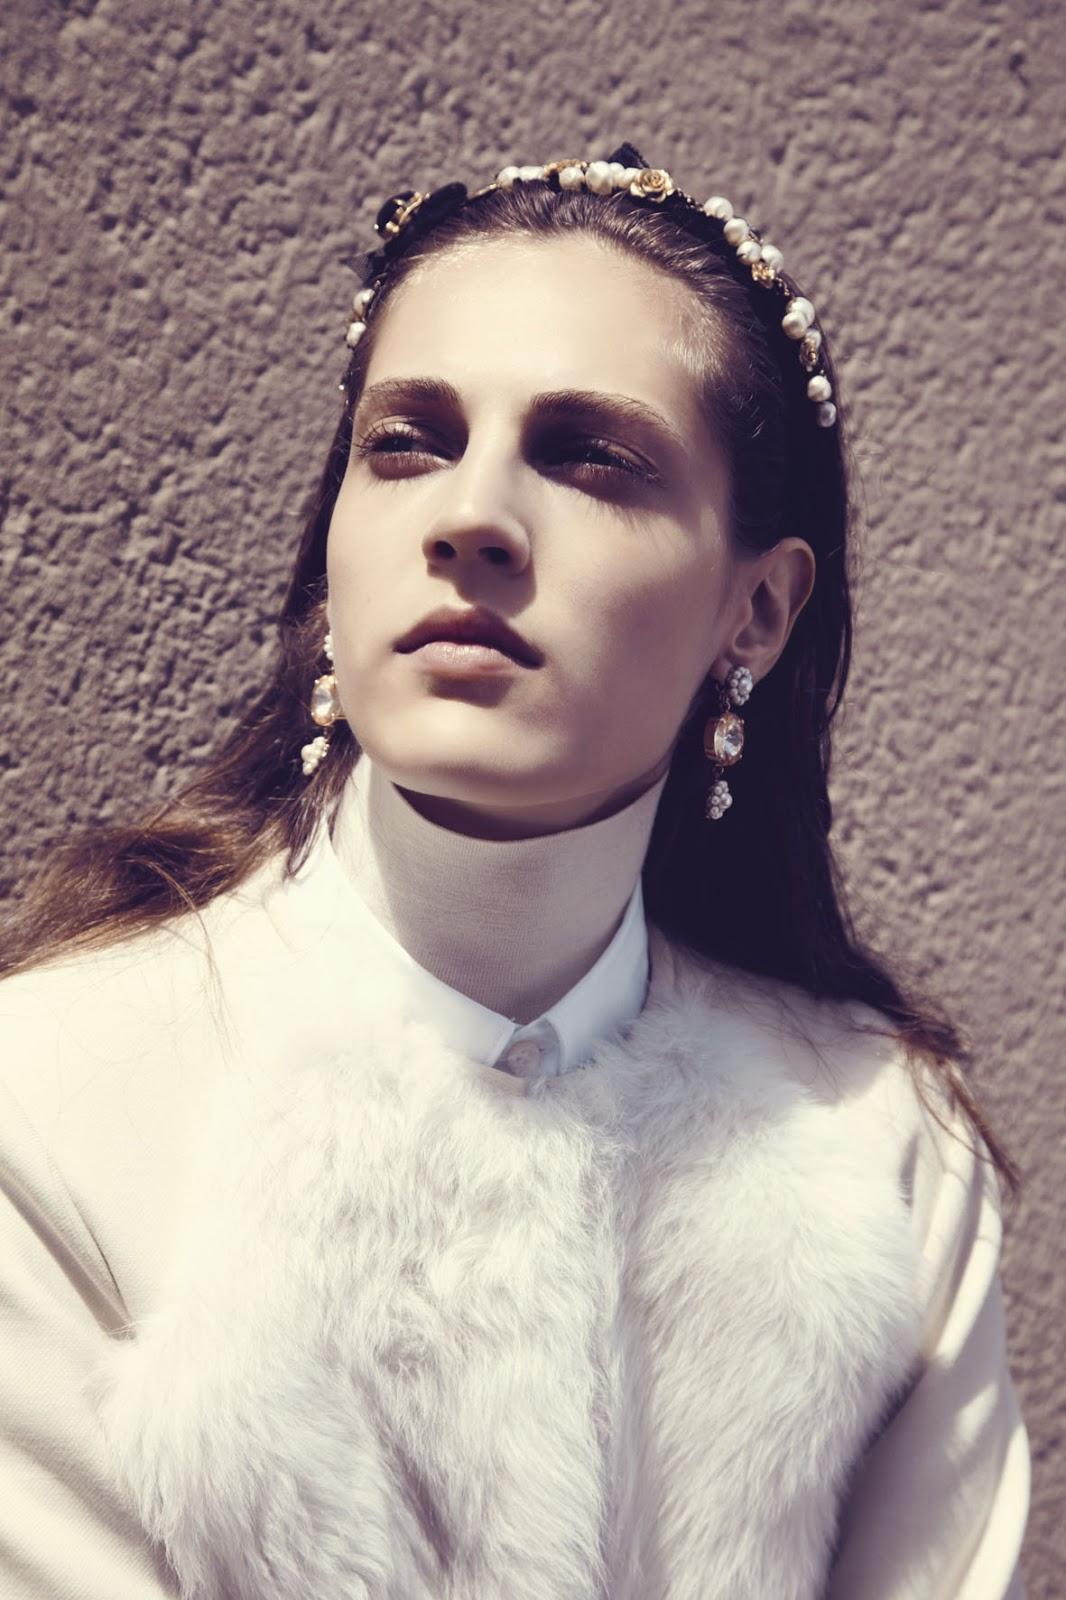 "Mixte Fall 2012 "" There Is Light"" | Carlotta Manaigo | Mixte | Celestine Cooney | Numerique Retouch Photo Retouching Studio"